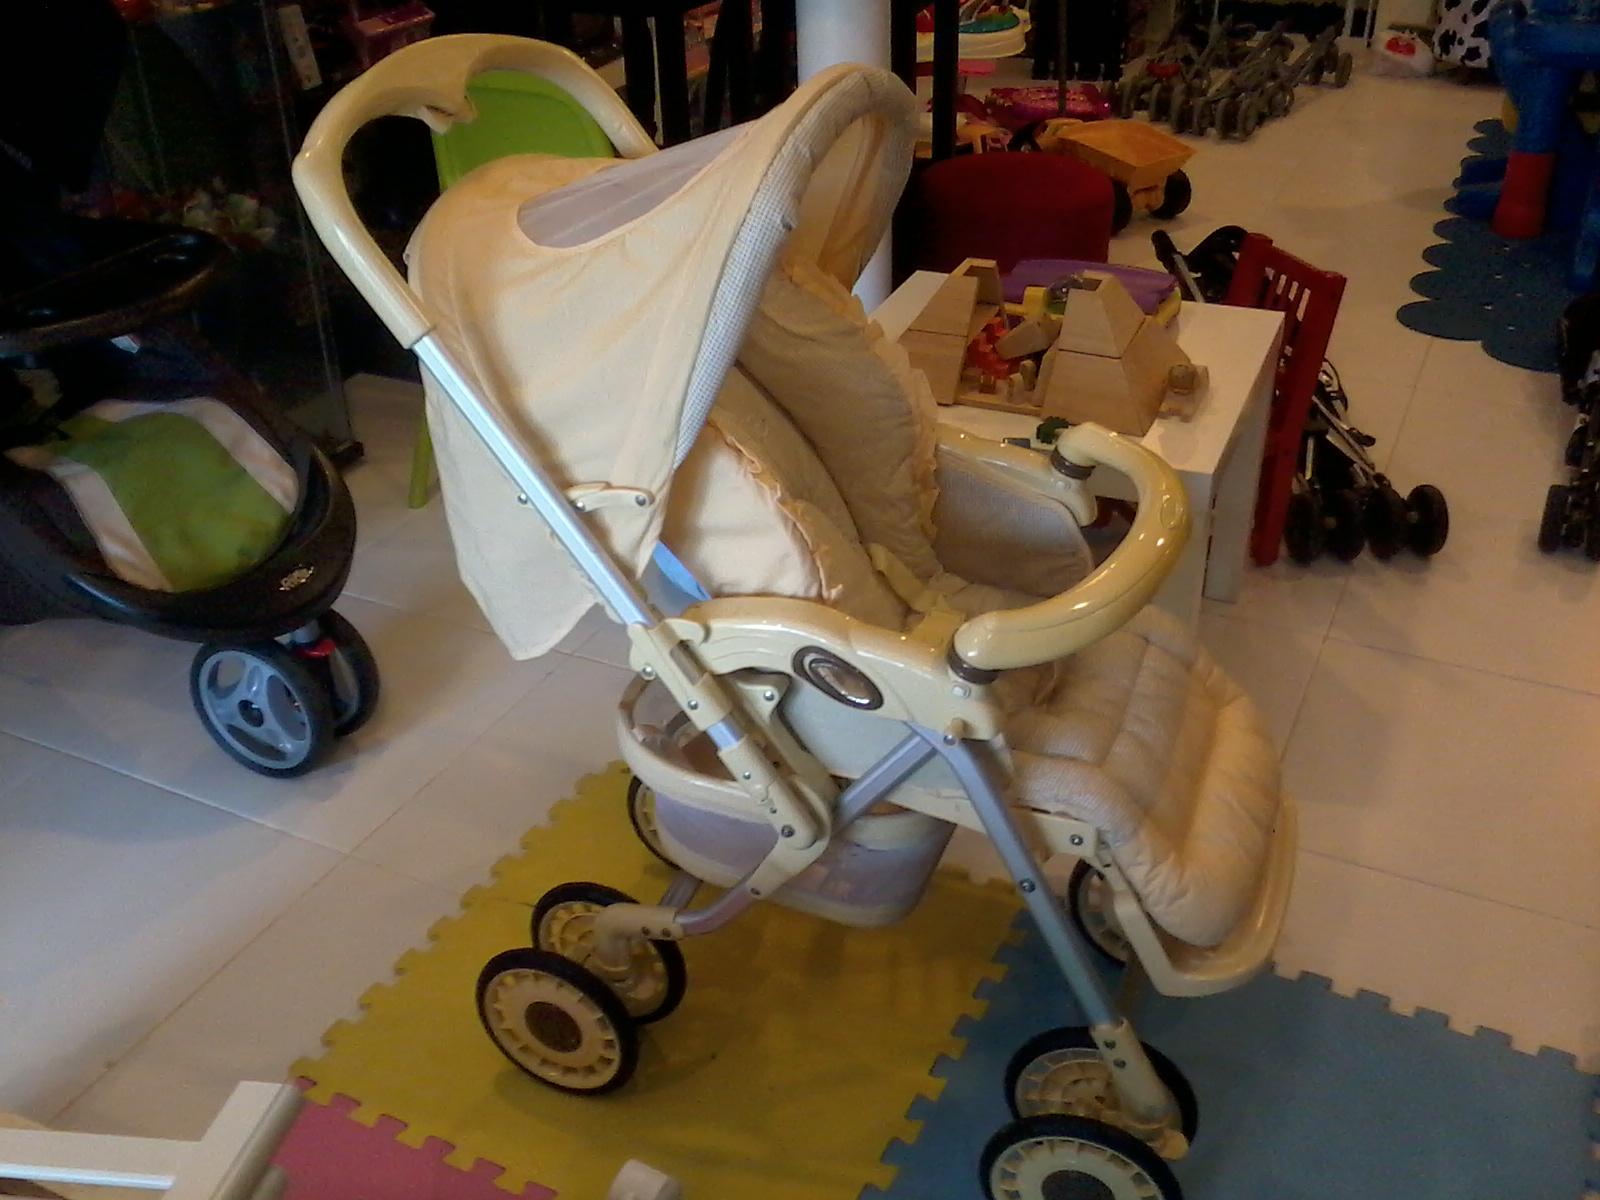 aliff preloved store capella reversible stroller : Photo2550 from aliffprelovedstore.blogspot.com size 1600 x 1200 jpeg 568kB